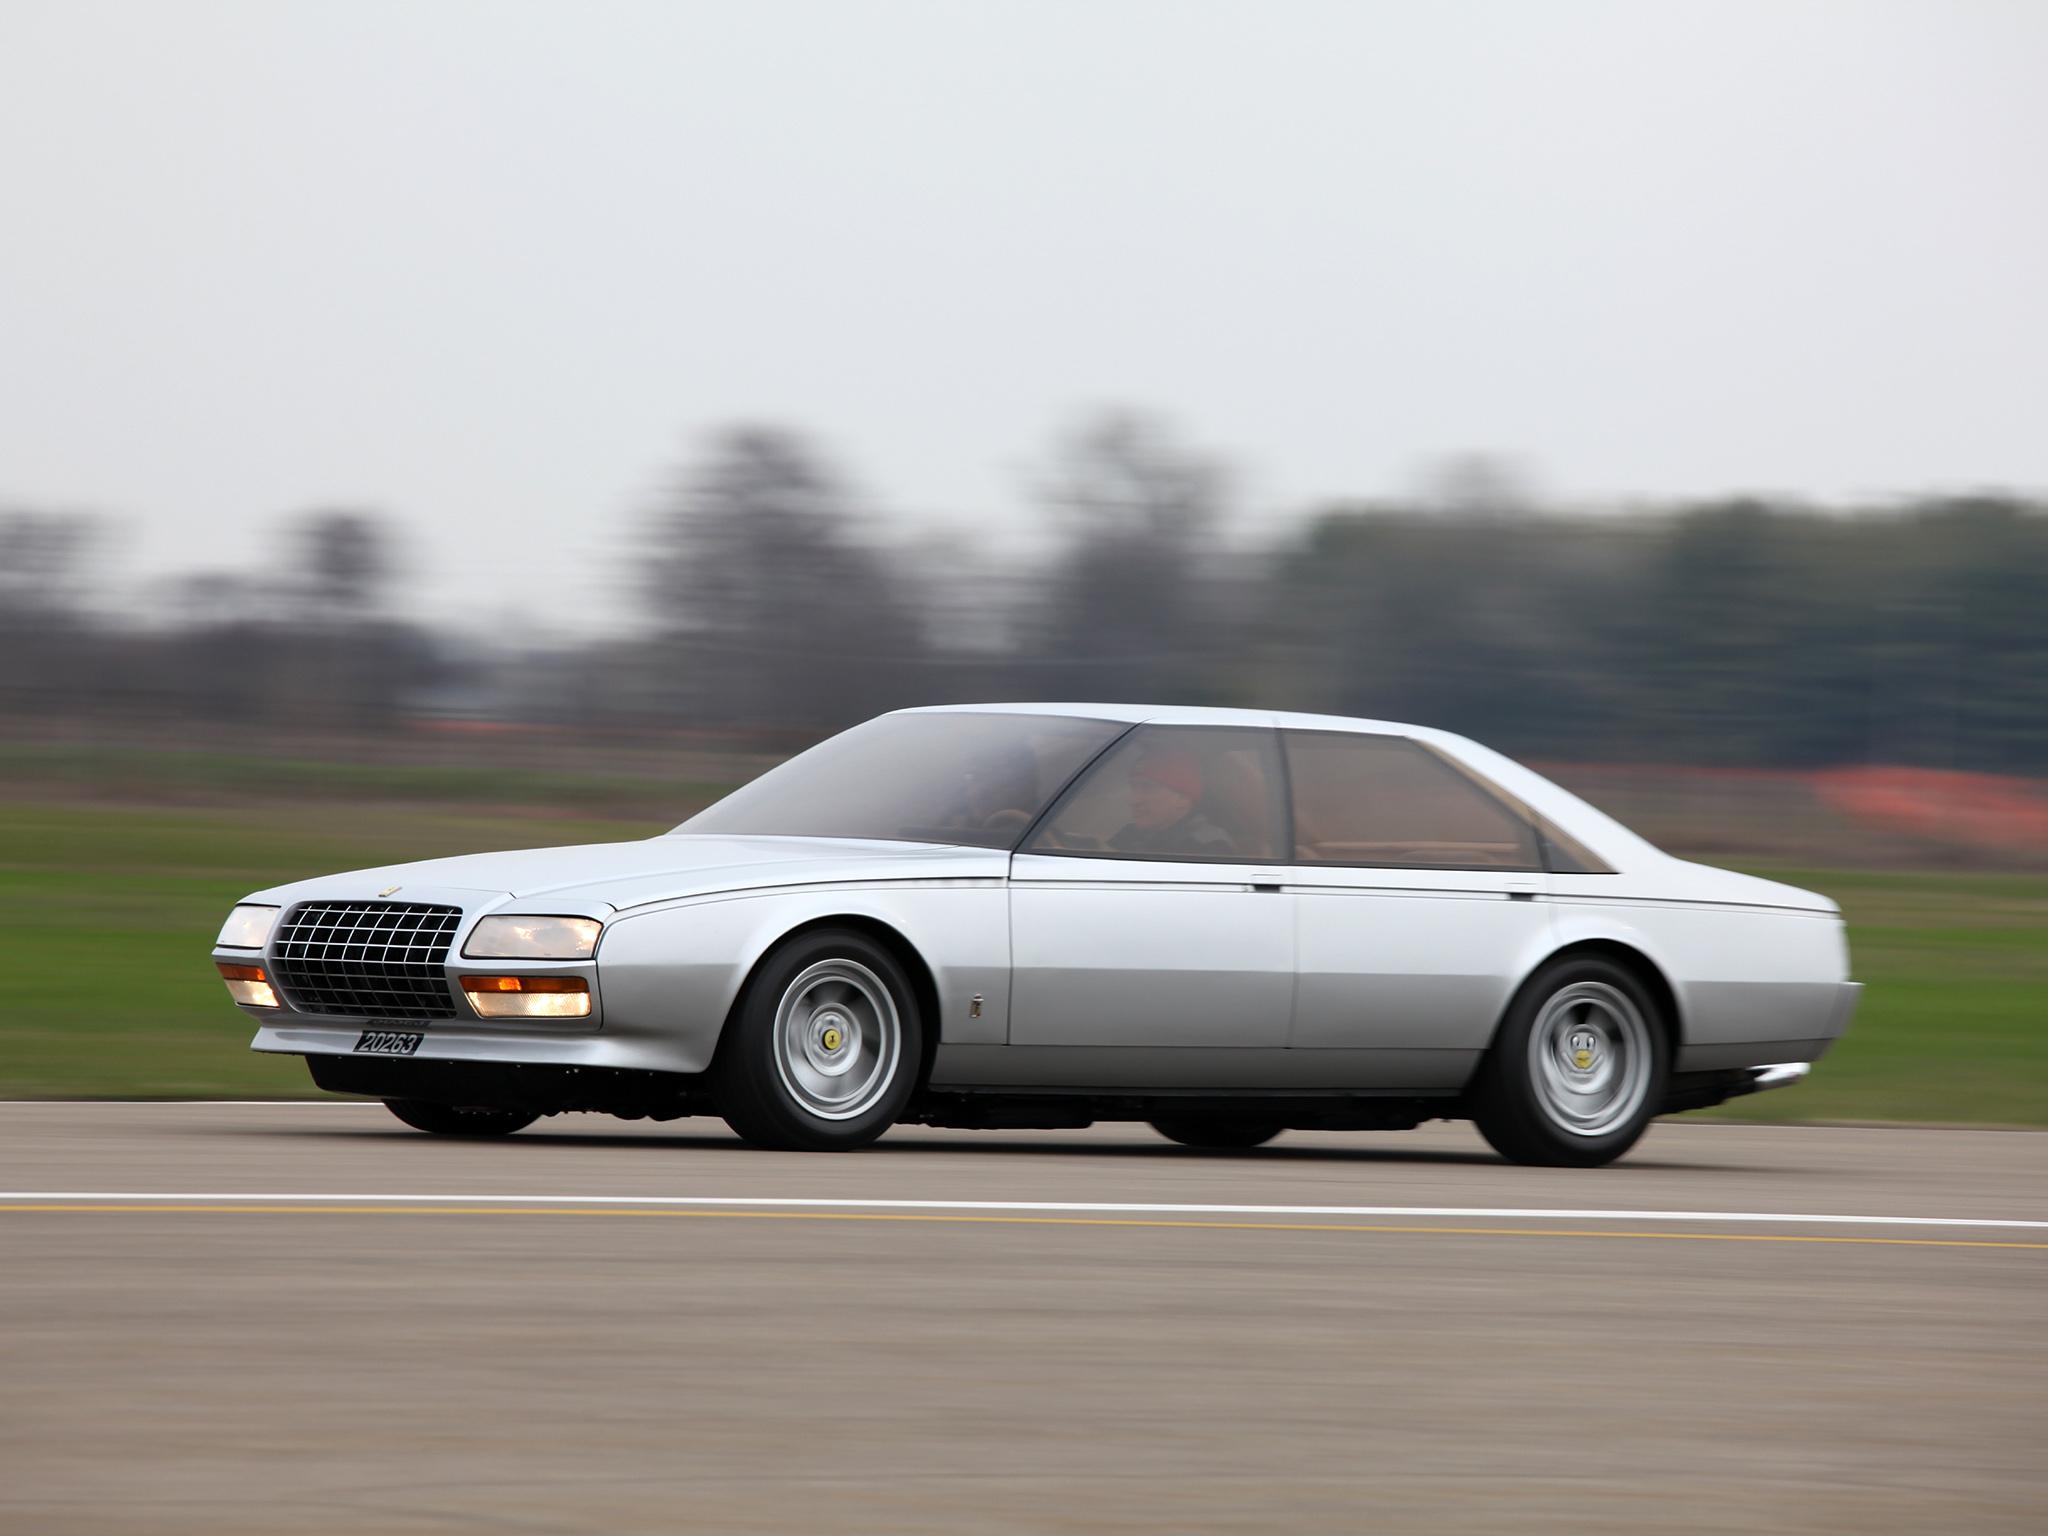 1980 Ferrari Pinin [zapomniane koncepty] « AUTOKULT.pl